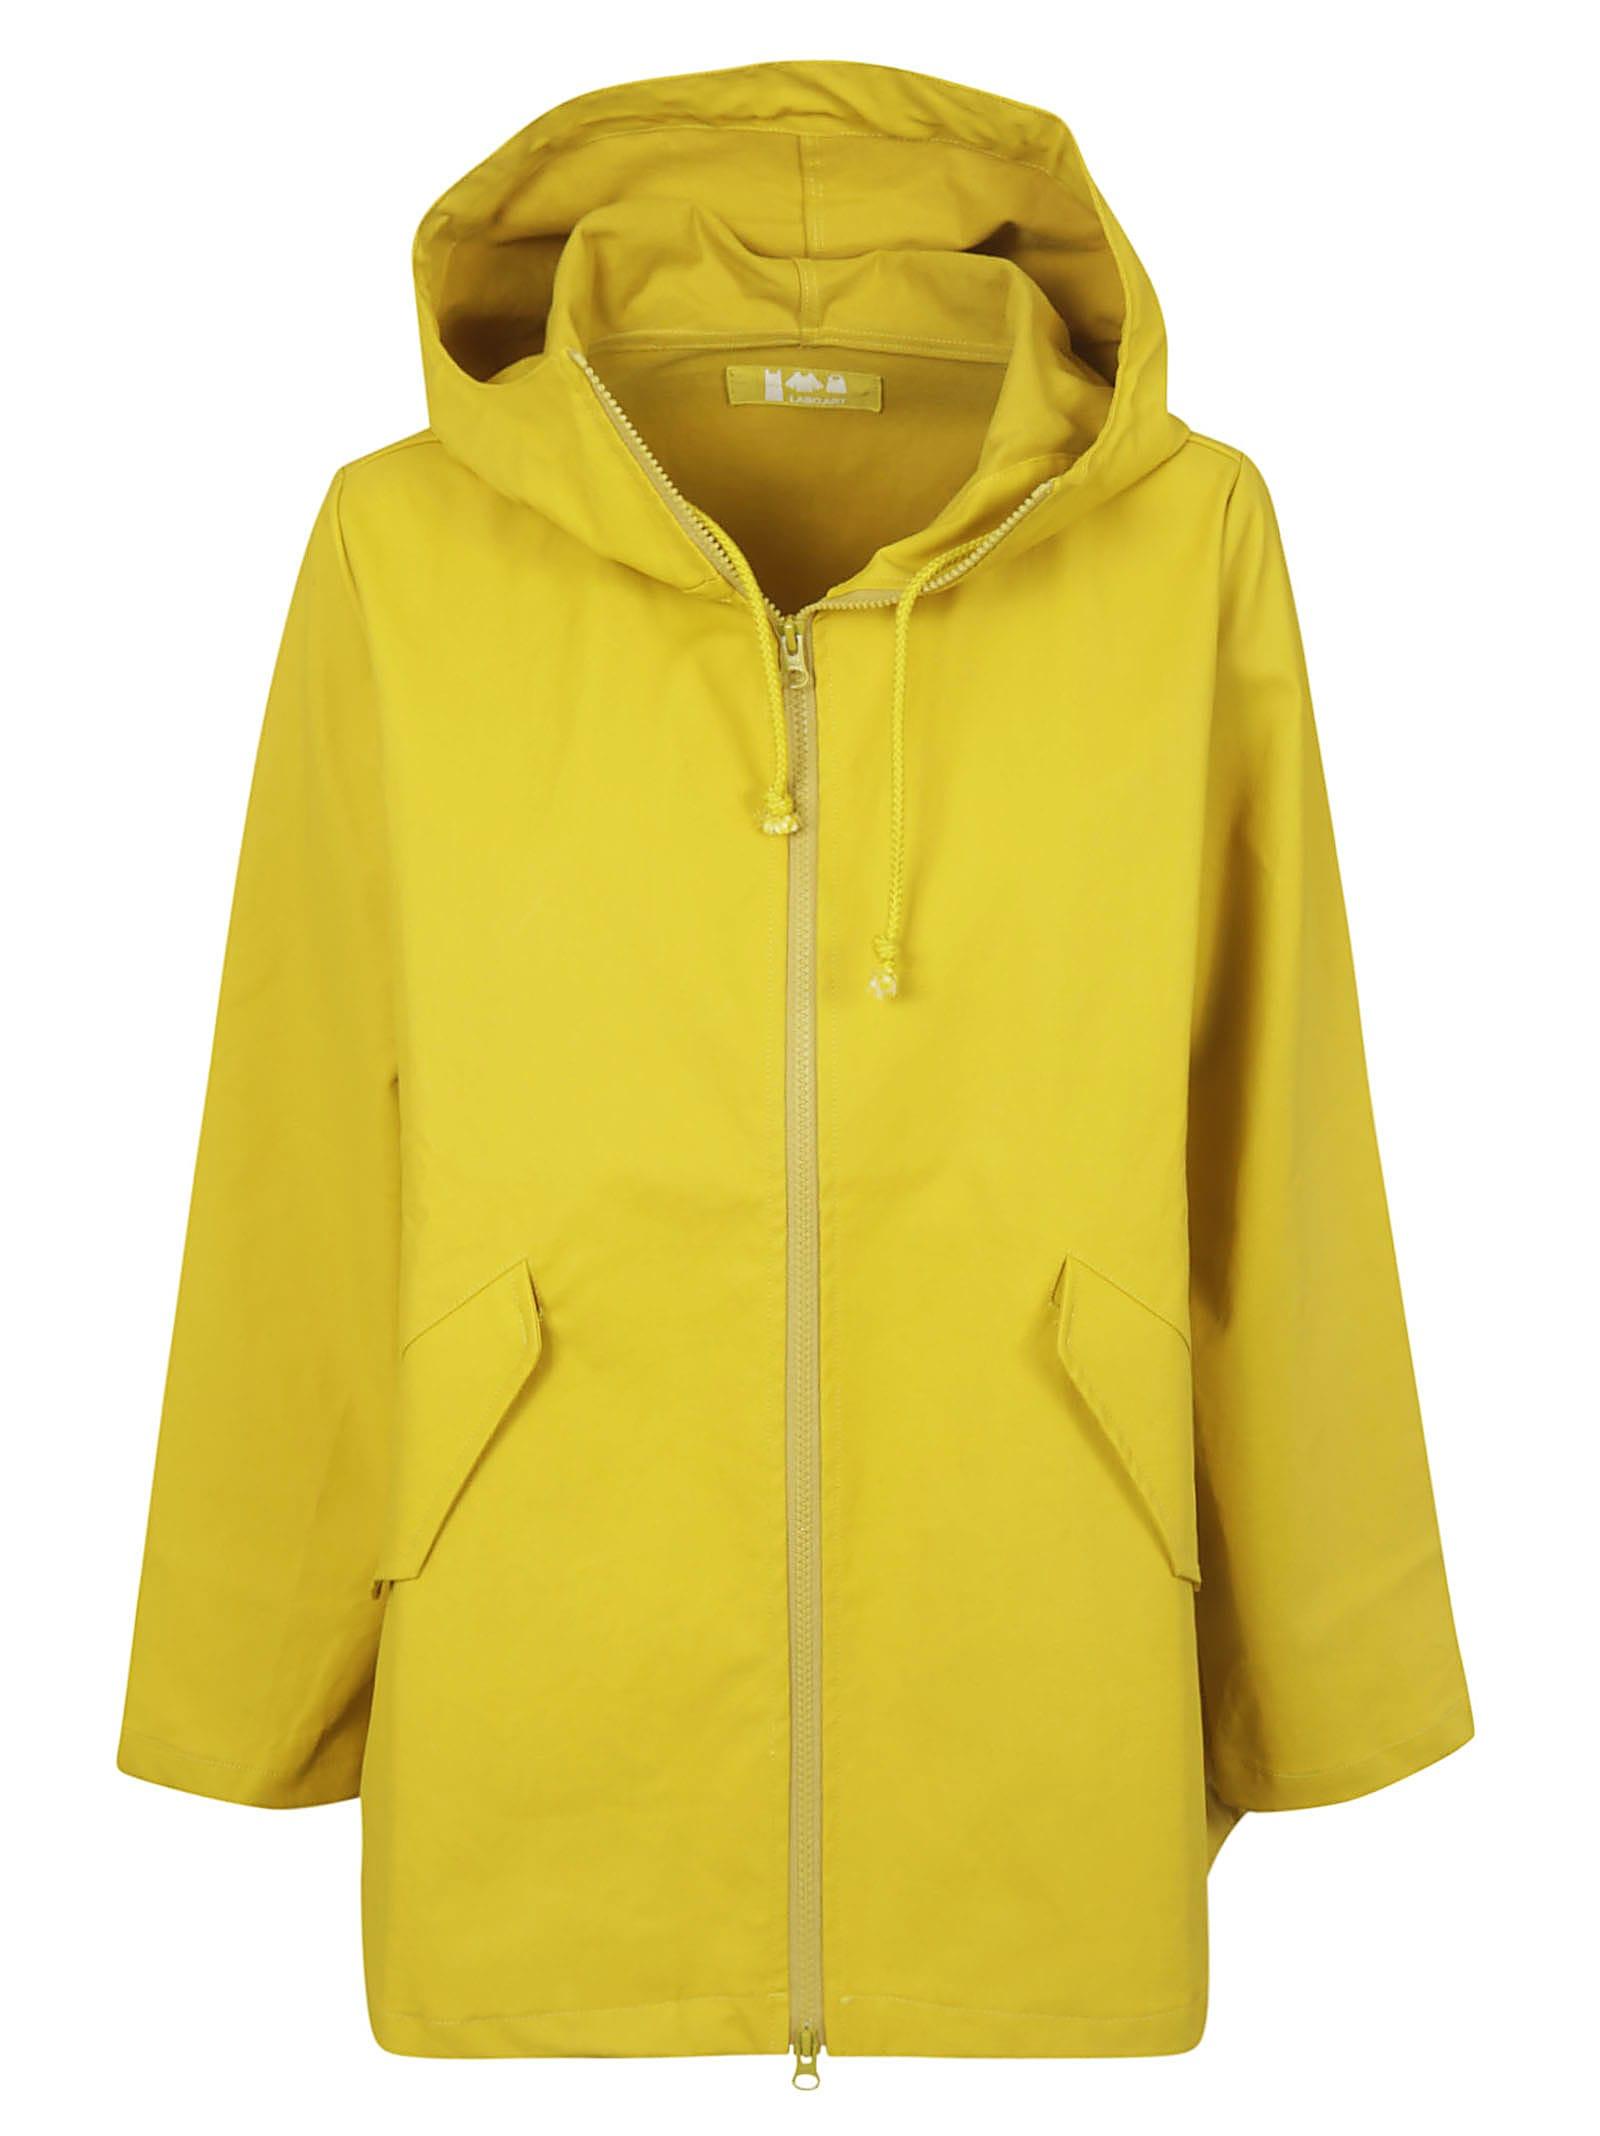 Labo. Art Hooded Zip Jacket